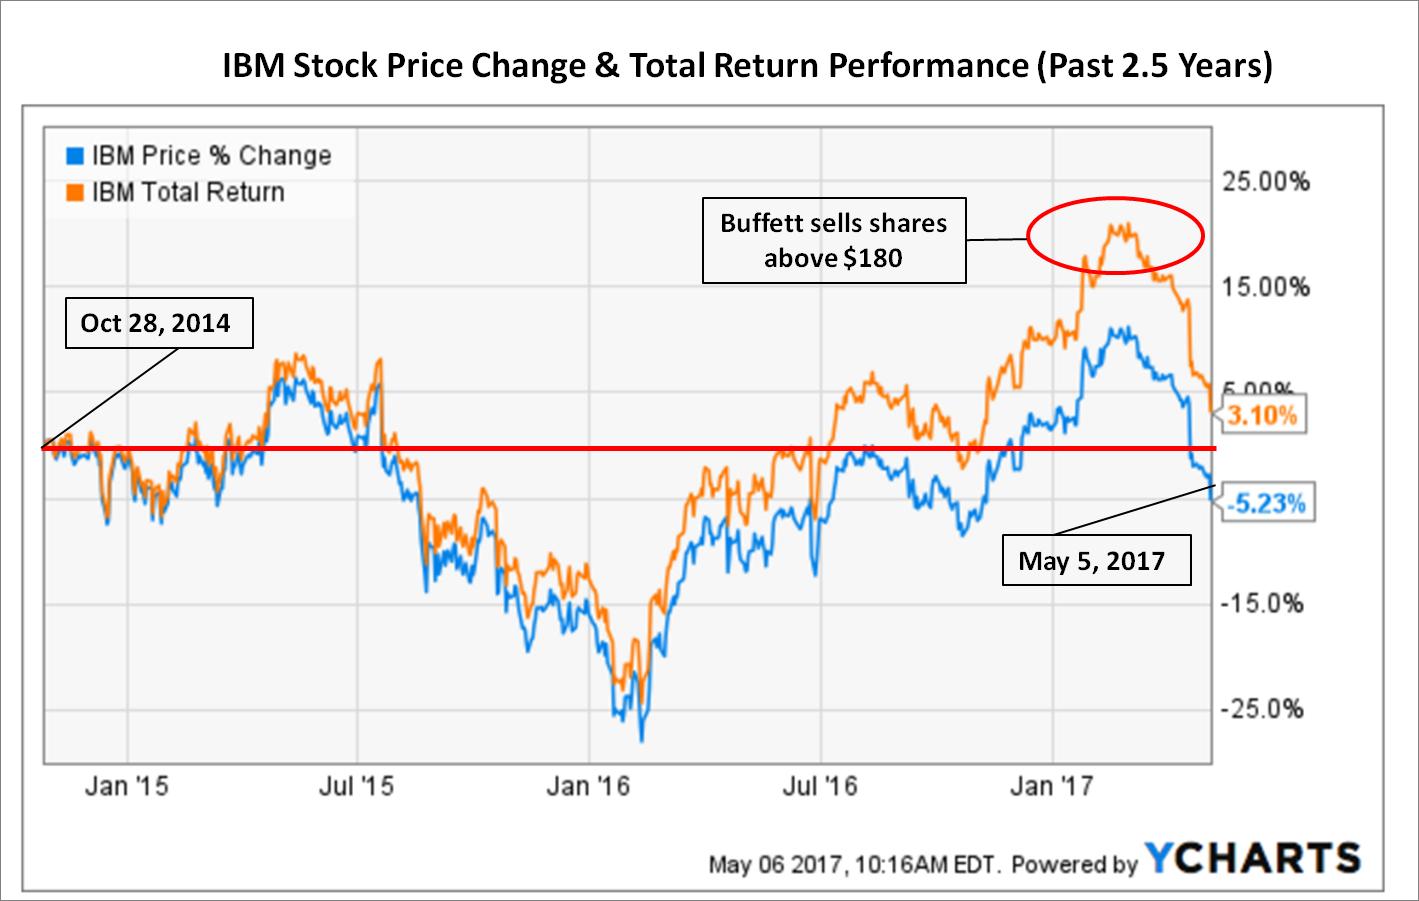 IBM Continues Its Downward Growth Trajectory As Warren Buffett Trims